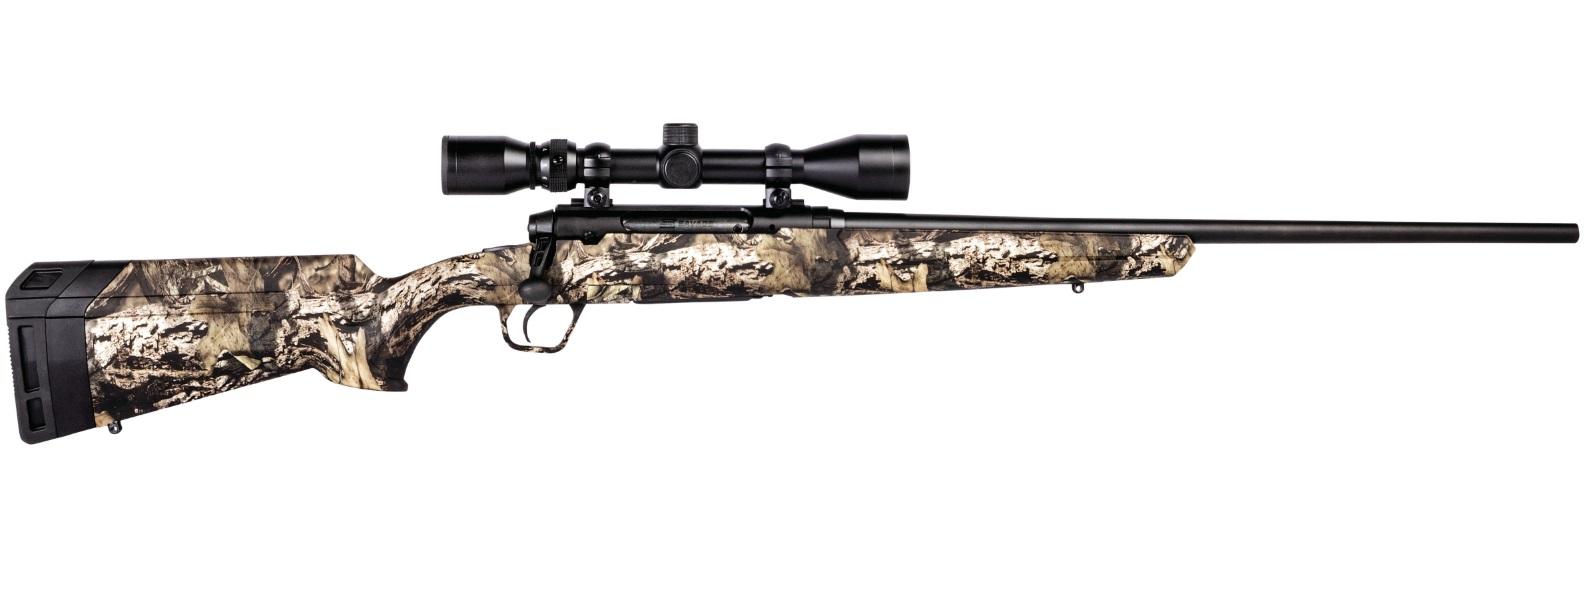 Savage Arms Axis XP Camo 25-06